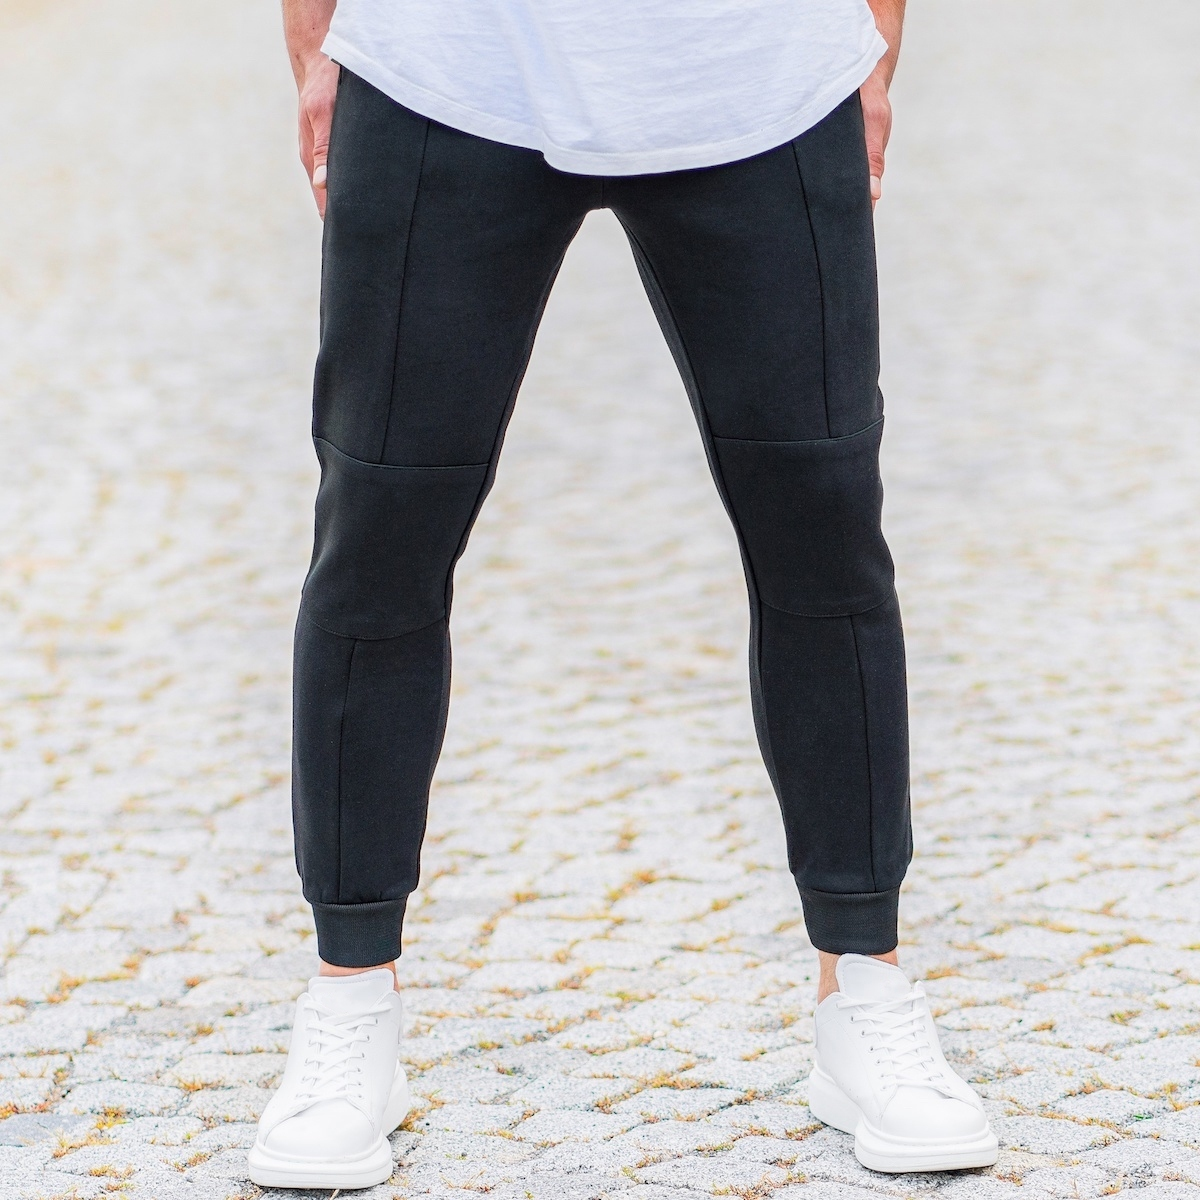 Erkek Dikiş Detaylı Siyah Pant Eşofman